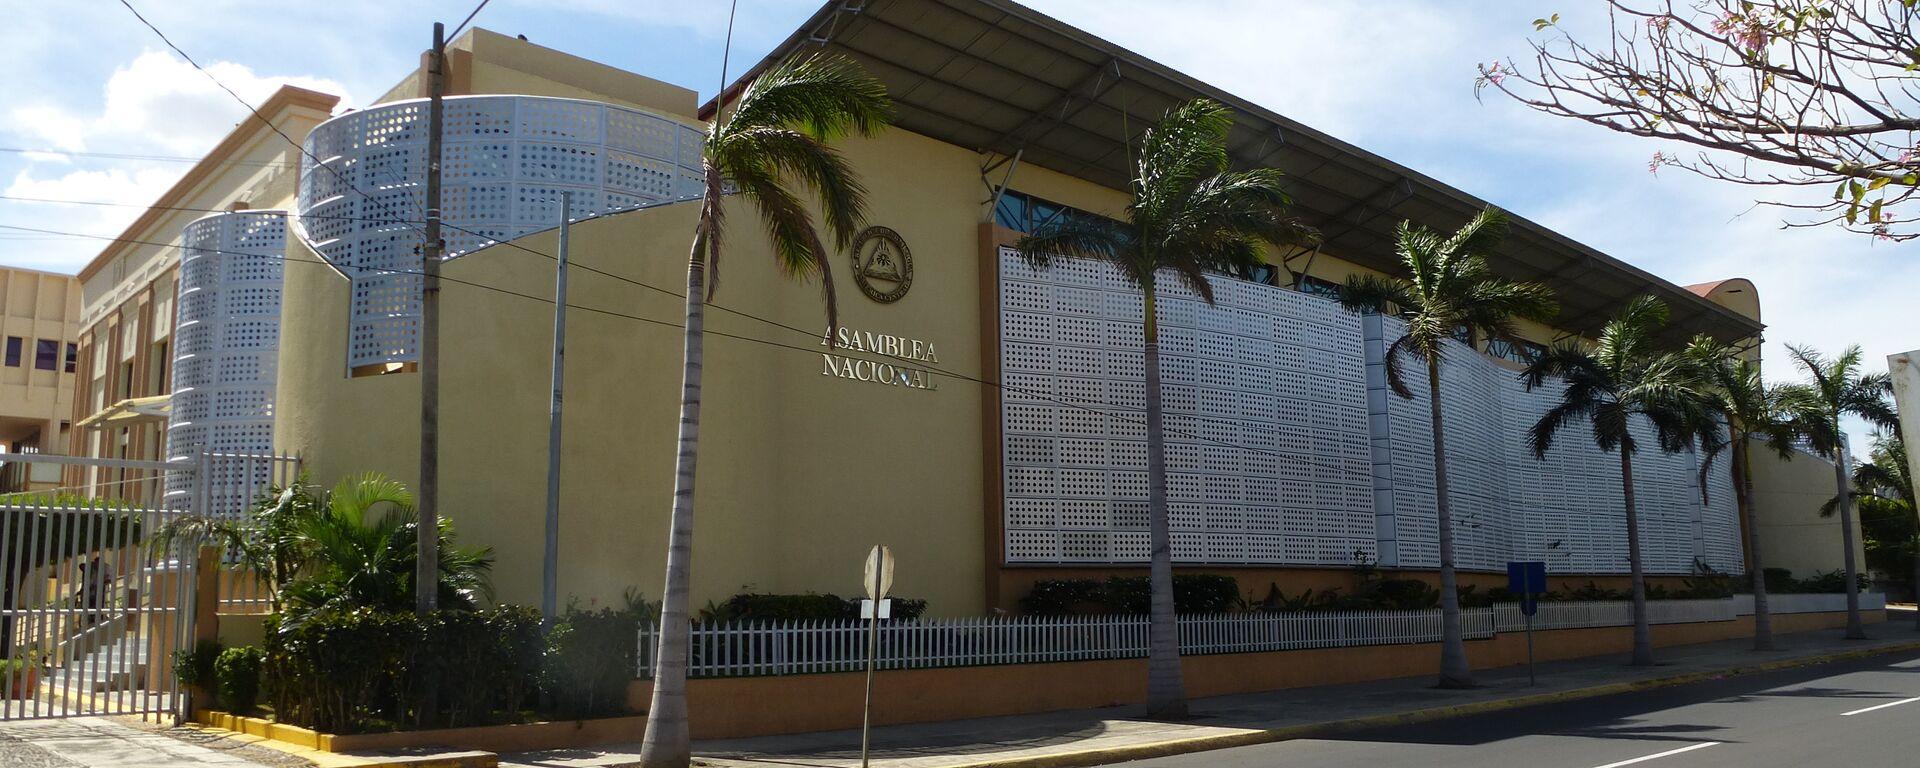 Asamblea Nacional de Nicaragua - Sputnik Mundo, 1920, 20.01.2021